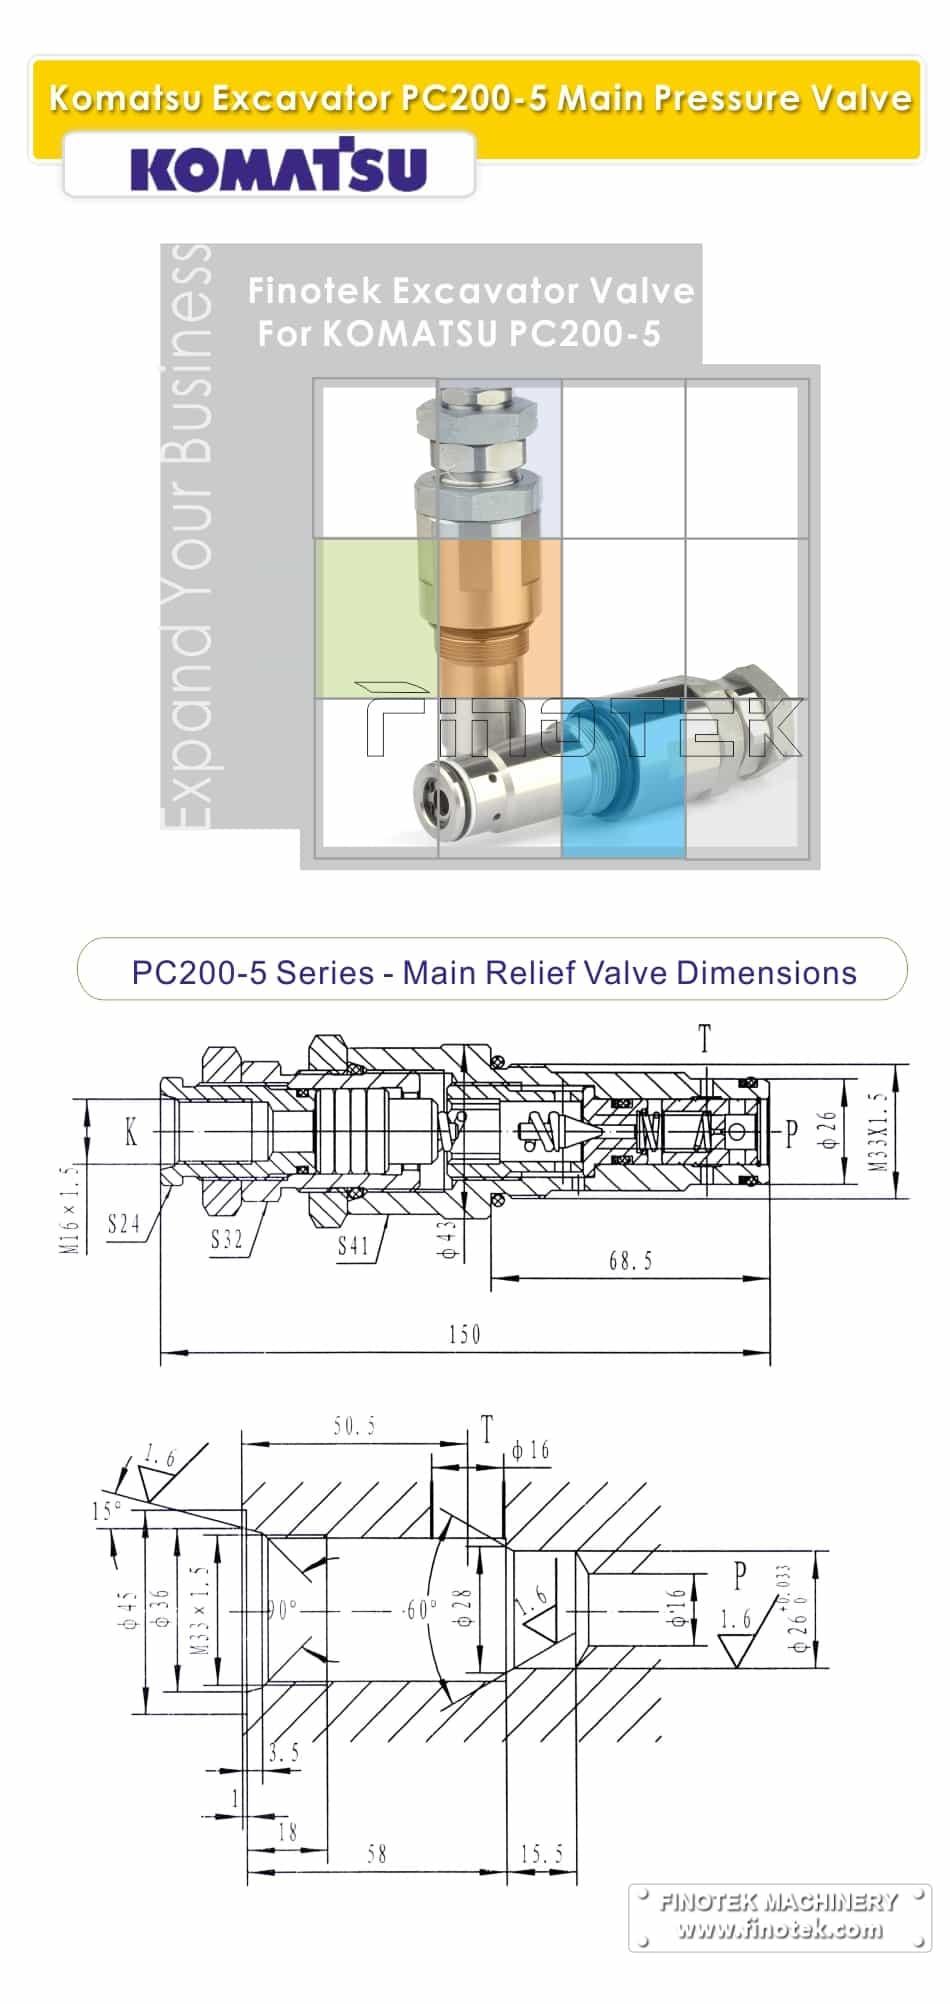 Komatsu PC200-5 Excavator tekanan kelegaan injap kawalan Ukuran